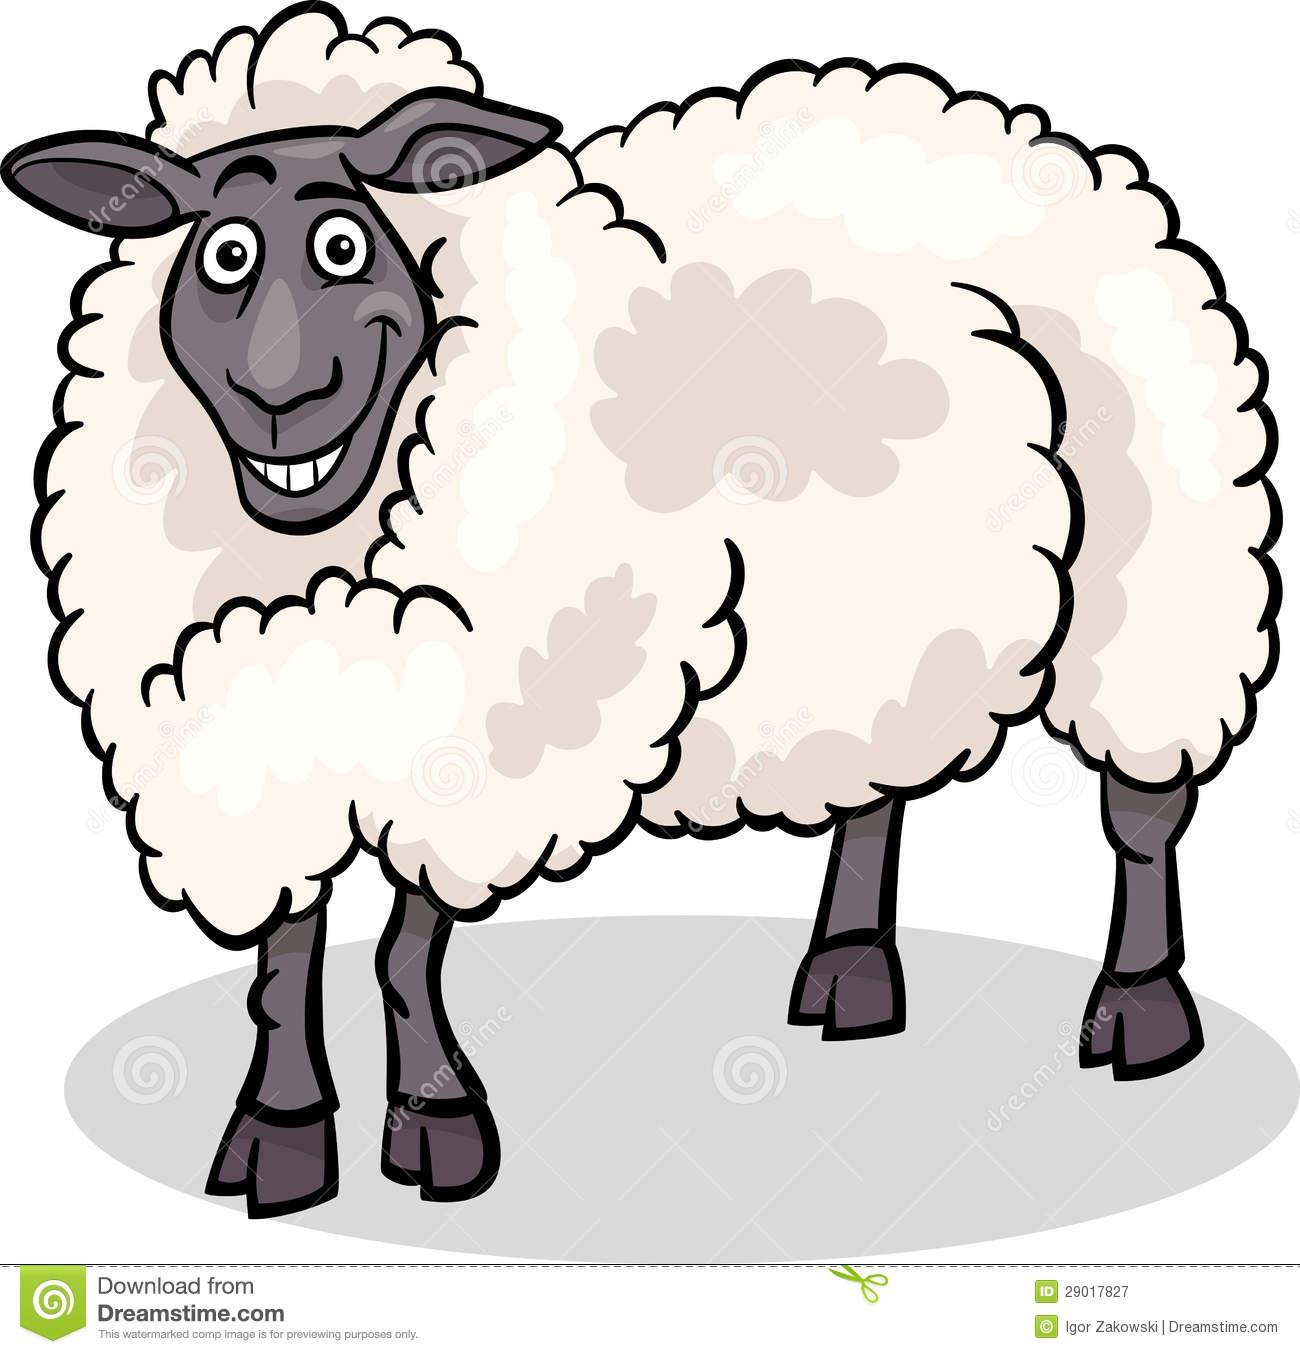 Sheep Farm Animal Cartoon Illustration Royalty Free Stock.